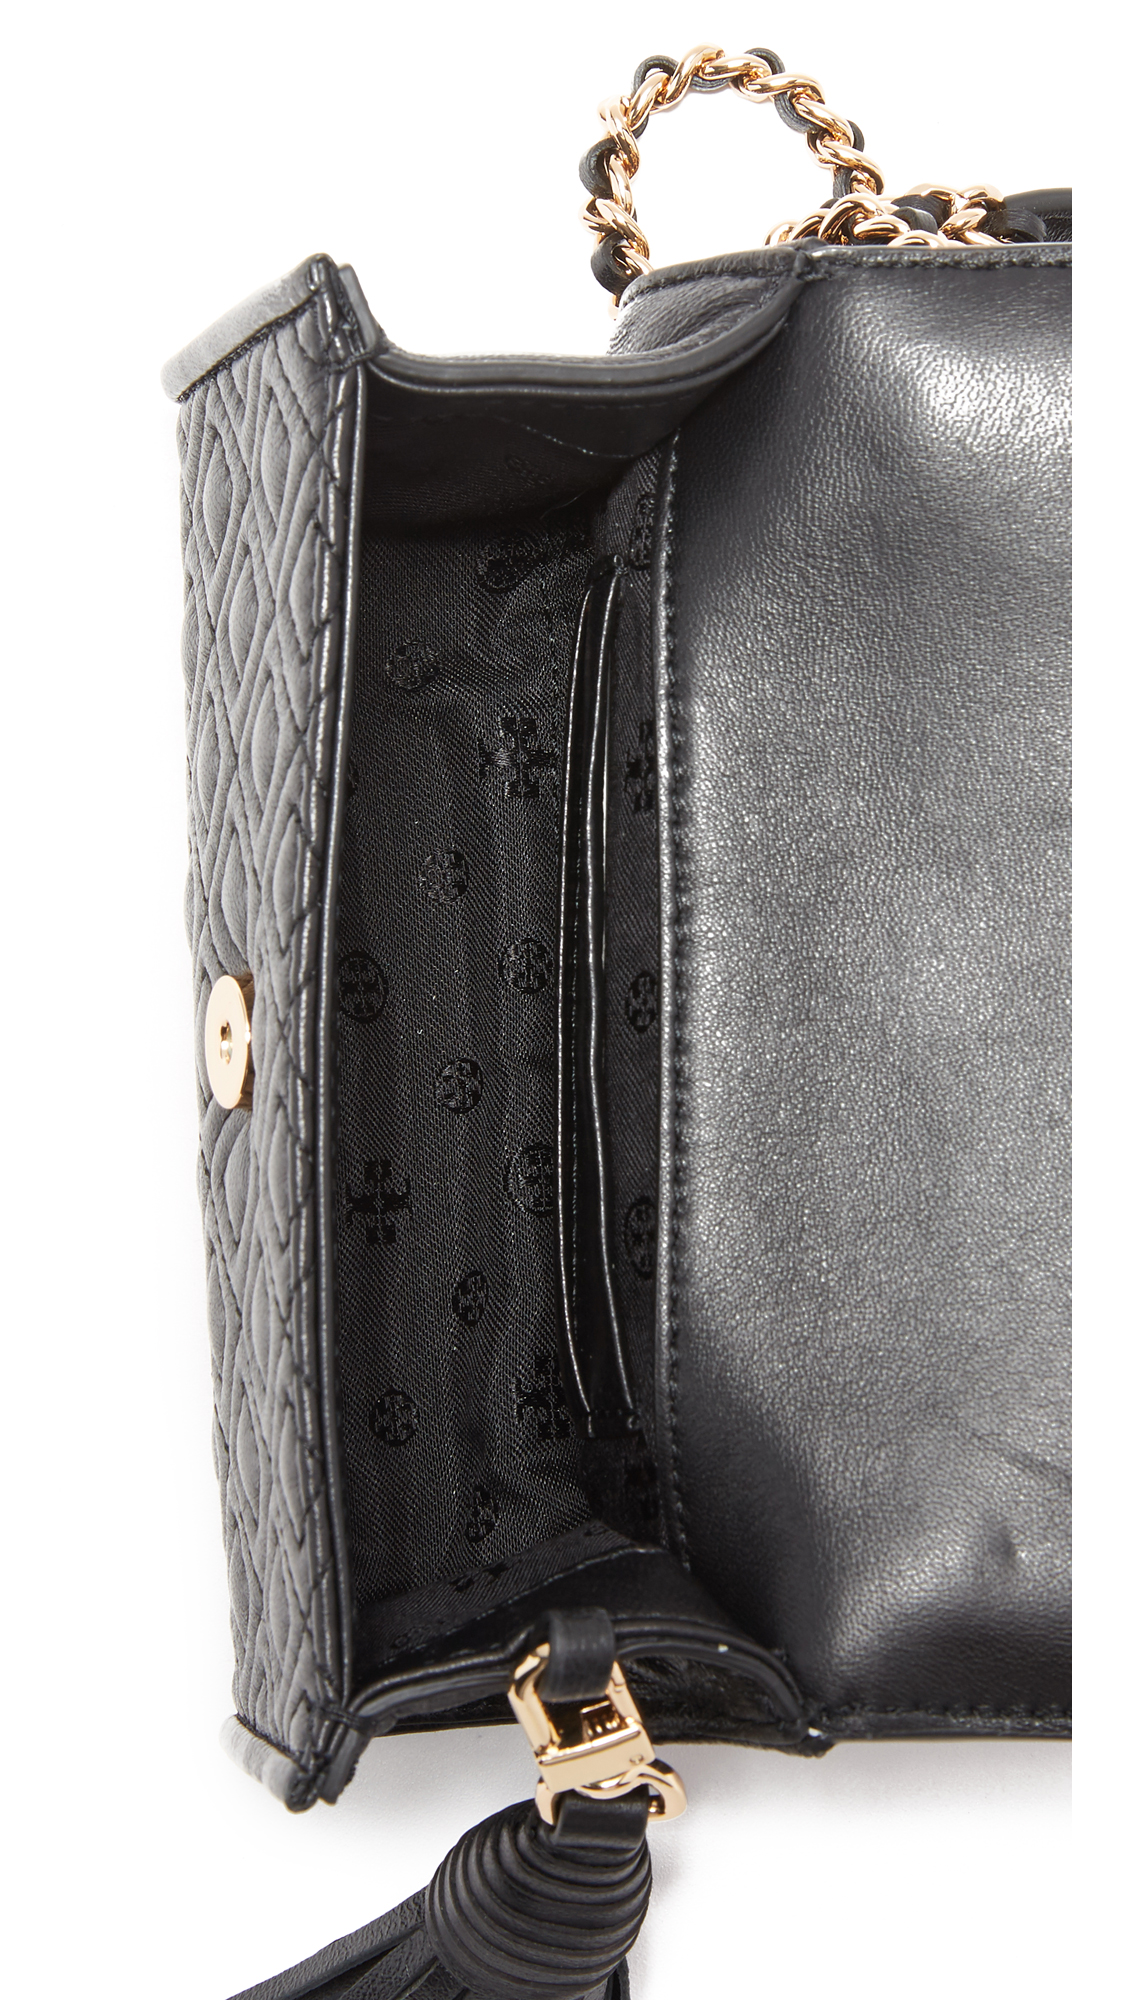 f7e198cb22e Tory Burch Micro Fleming Bag